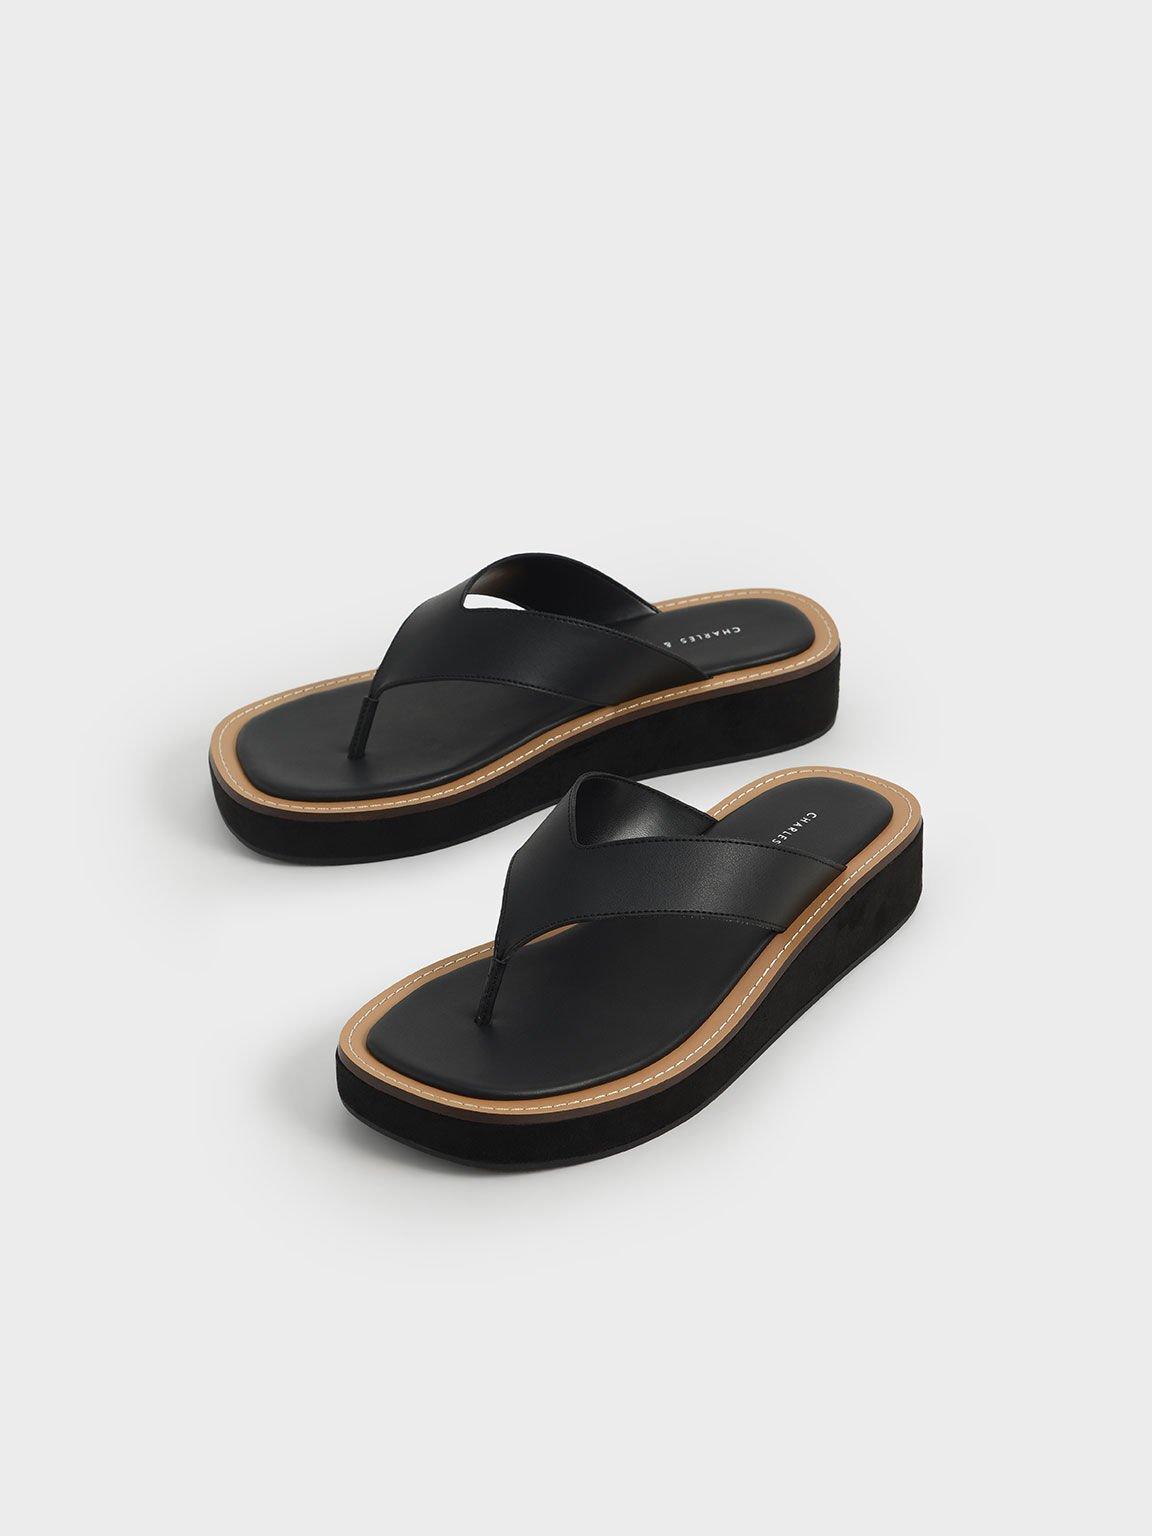 Platform Thong Sandals, Black, hi-res